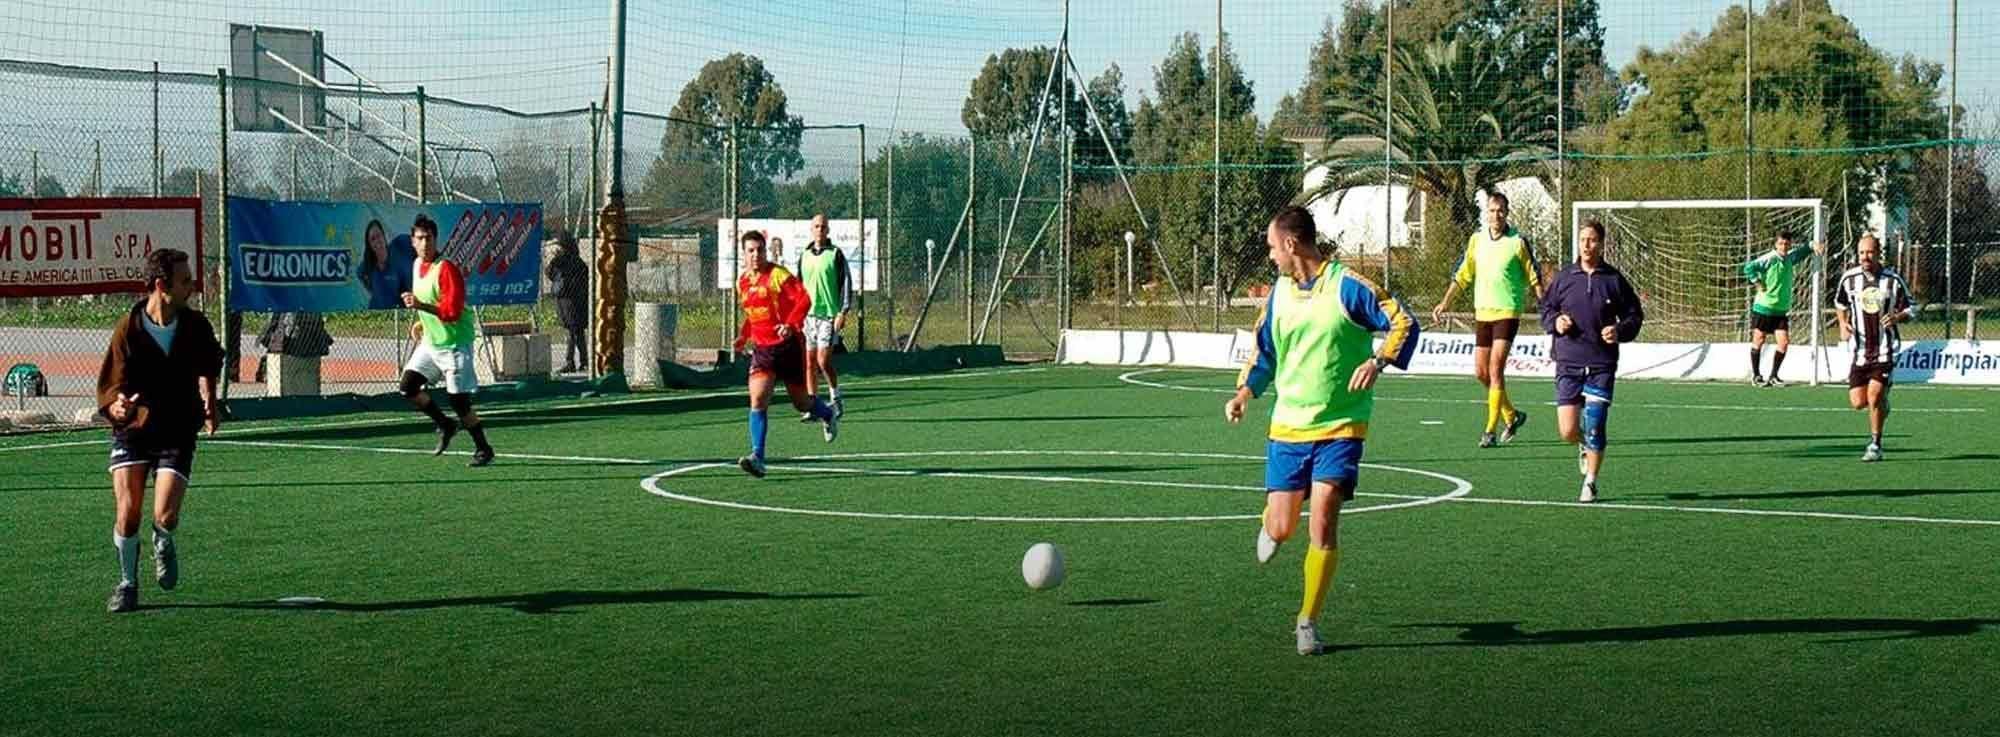 Taranto: Trofeo TuttoSport